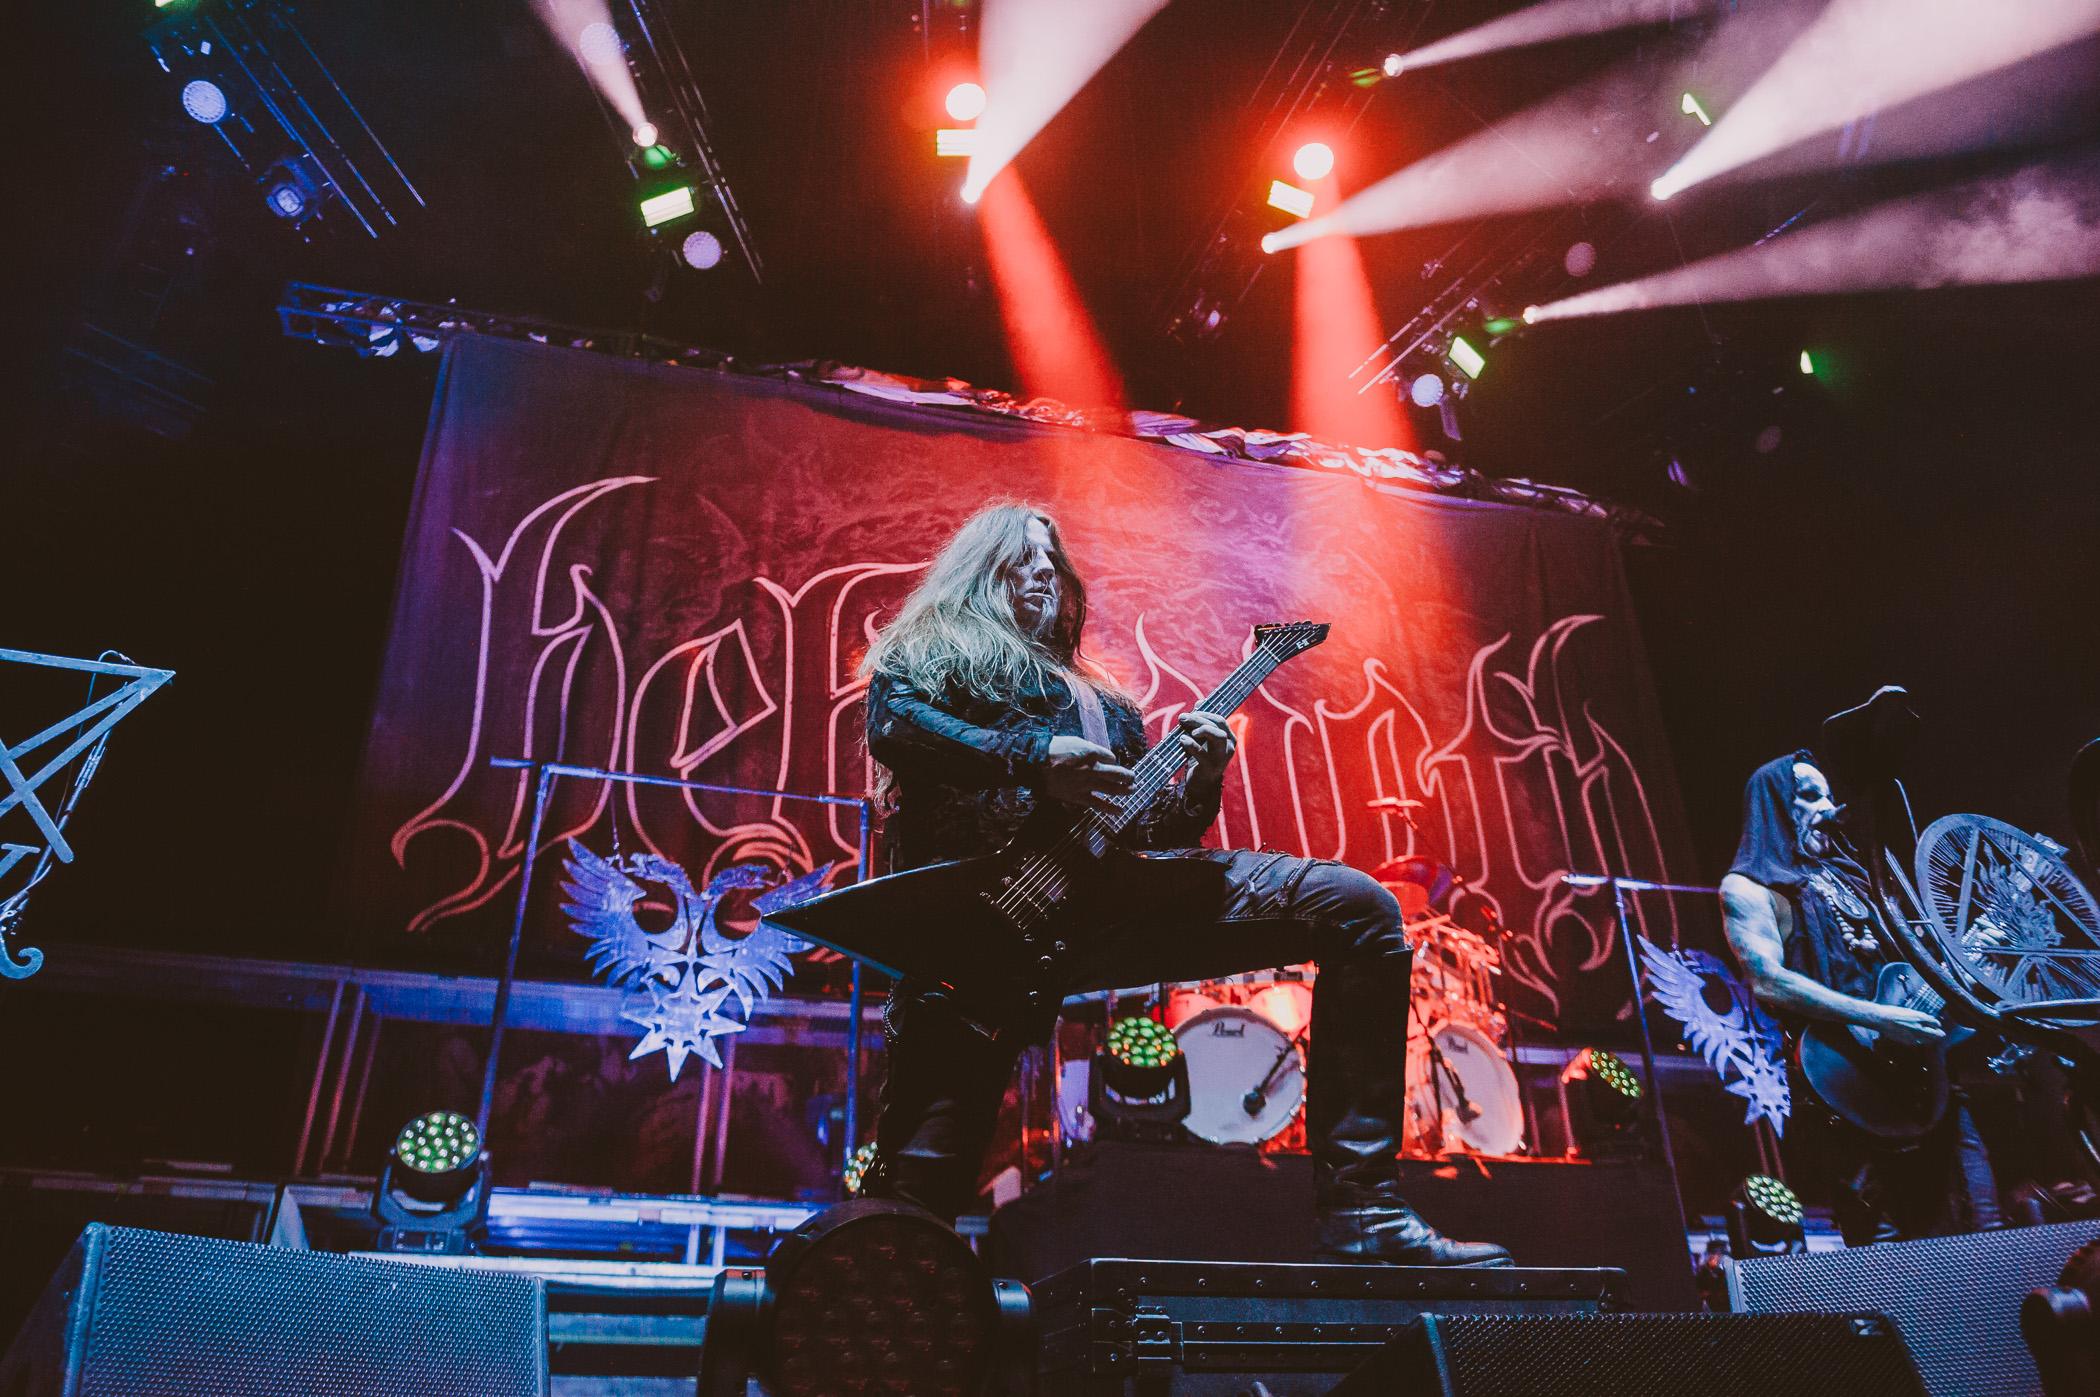 2_Behemoth-Pacific_Coliseum-Vancouver-Timothy_Nguyen-20180516 (15 of 32).jpg